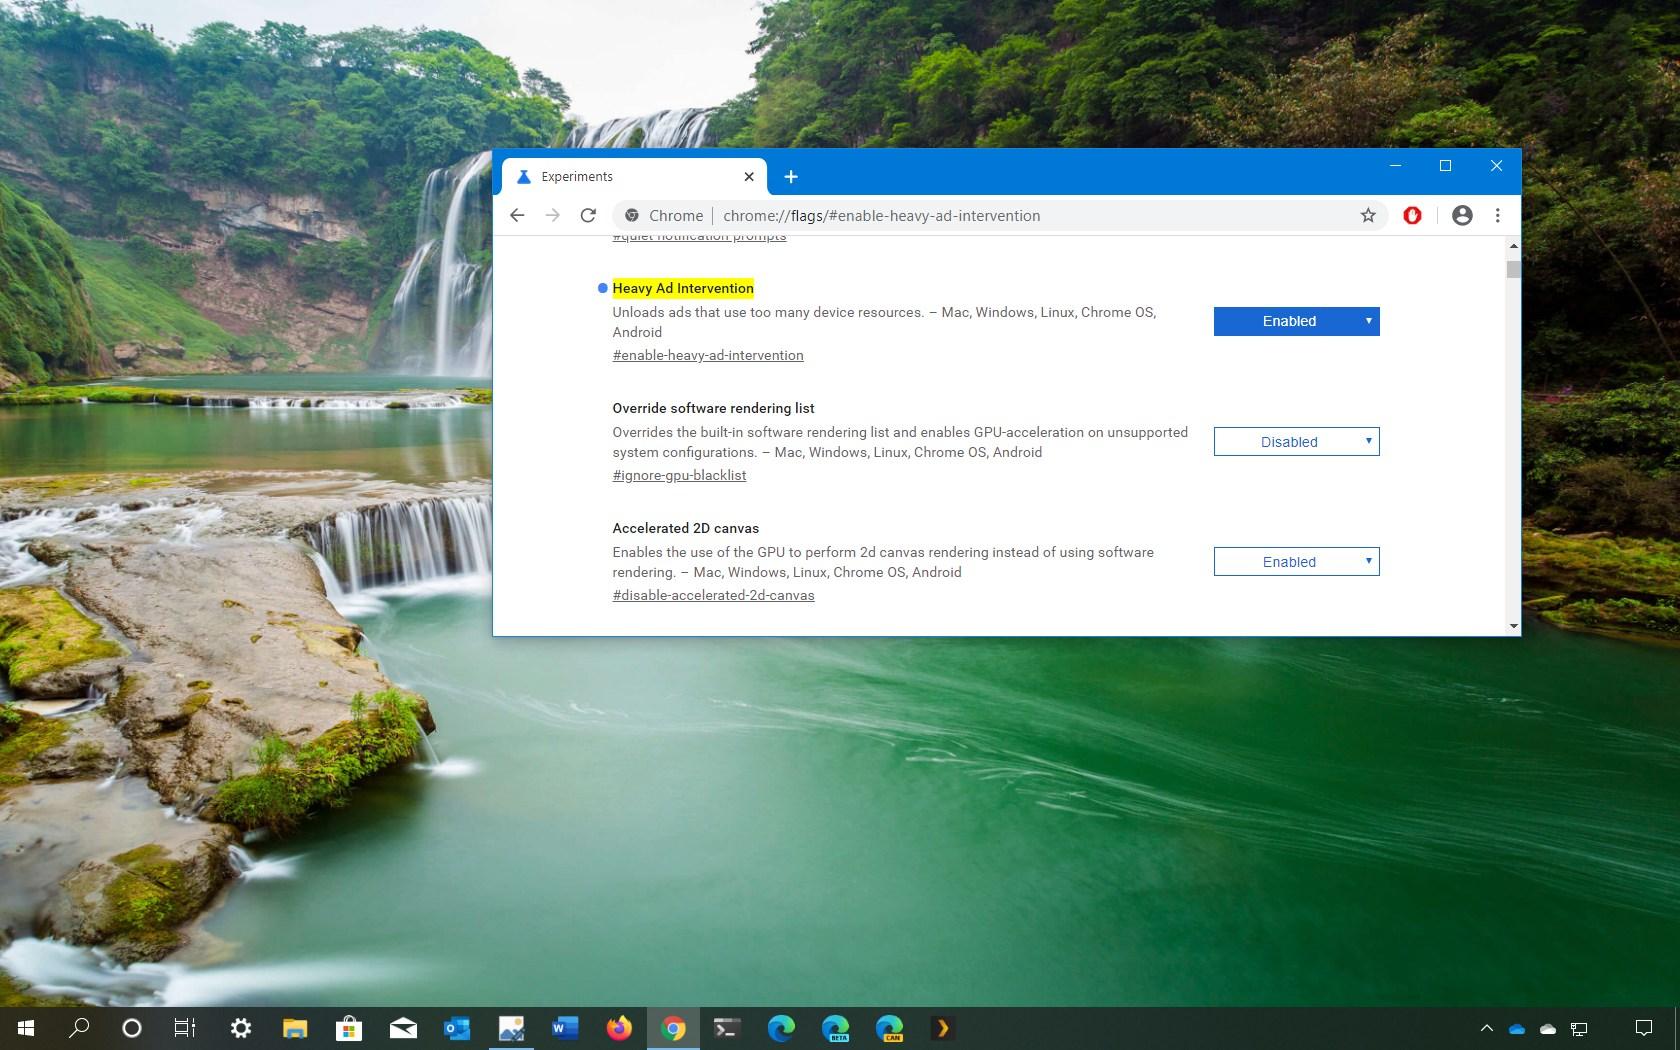 Chrome Heavy Ad Intervention option